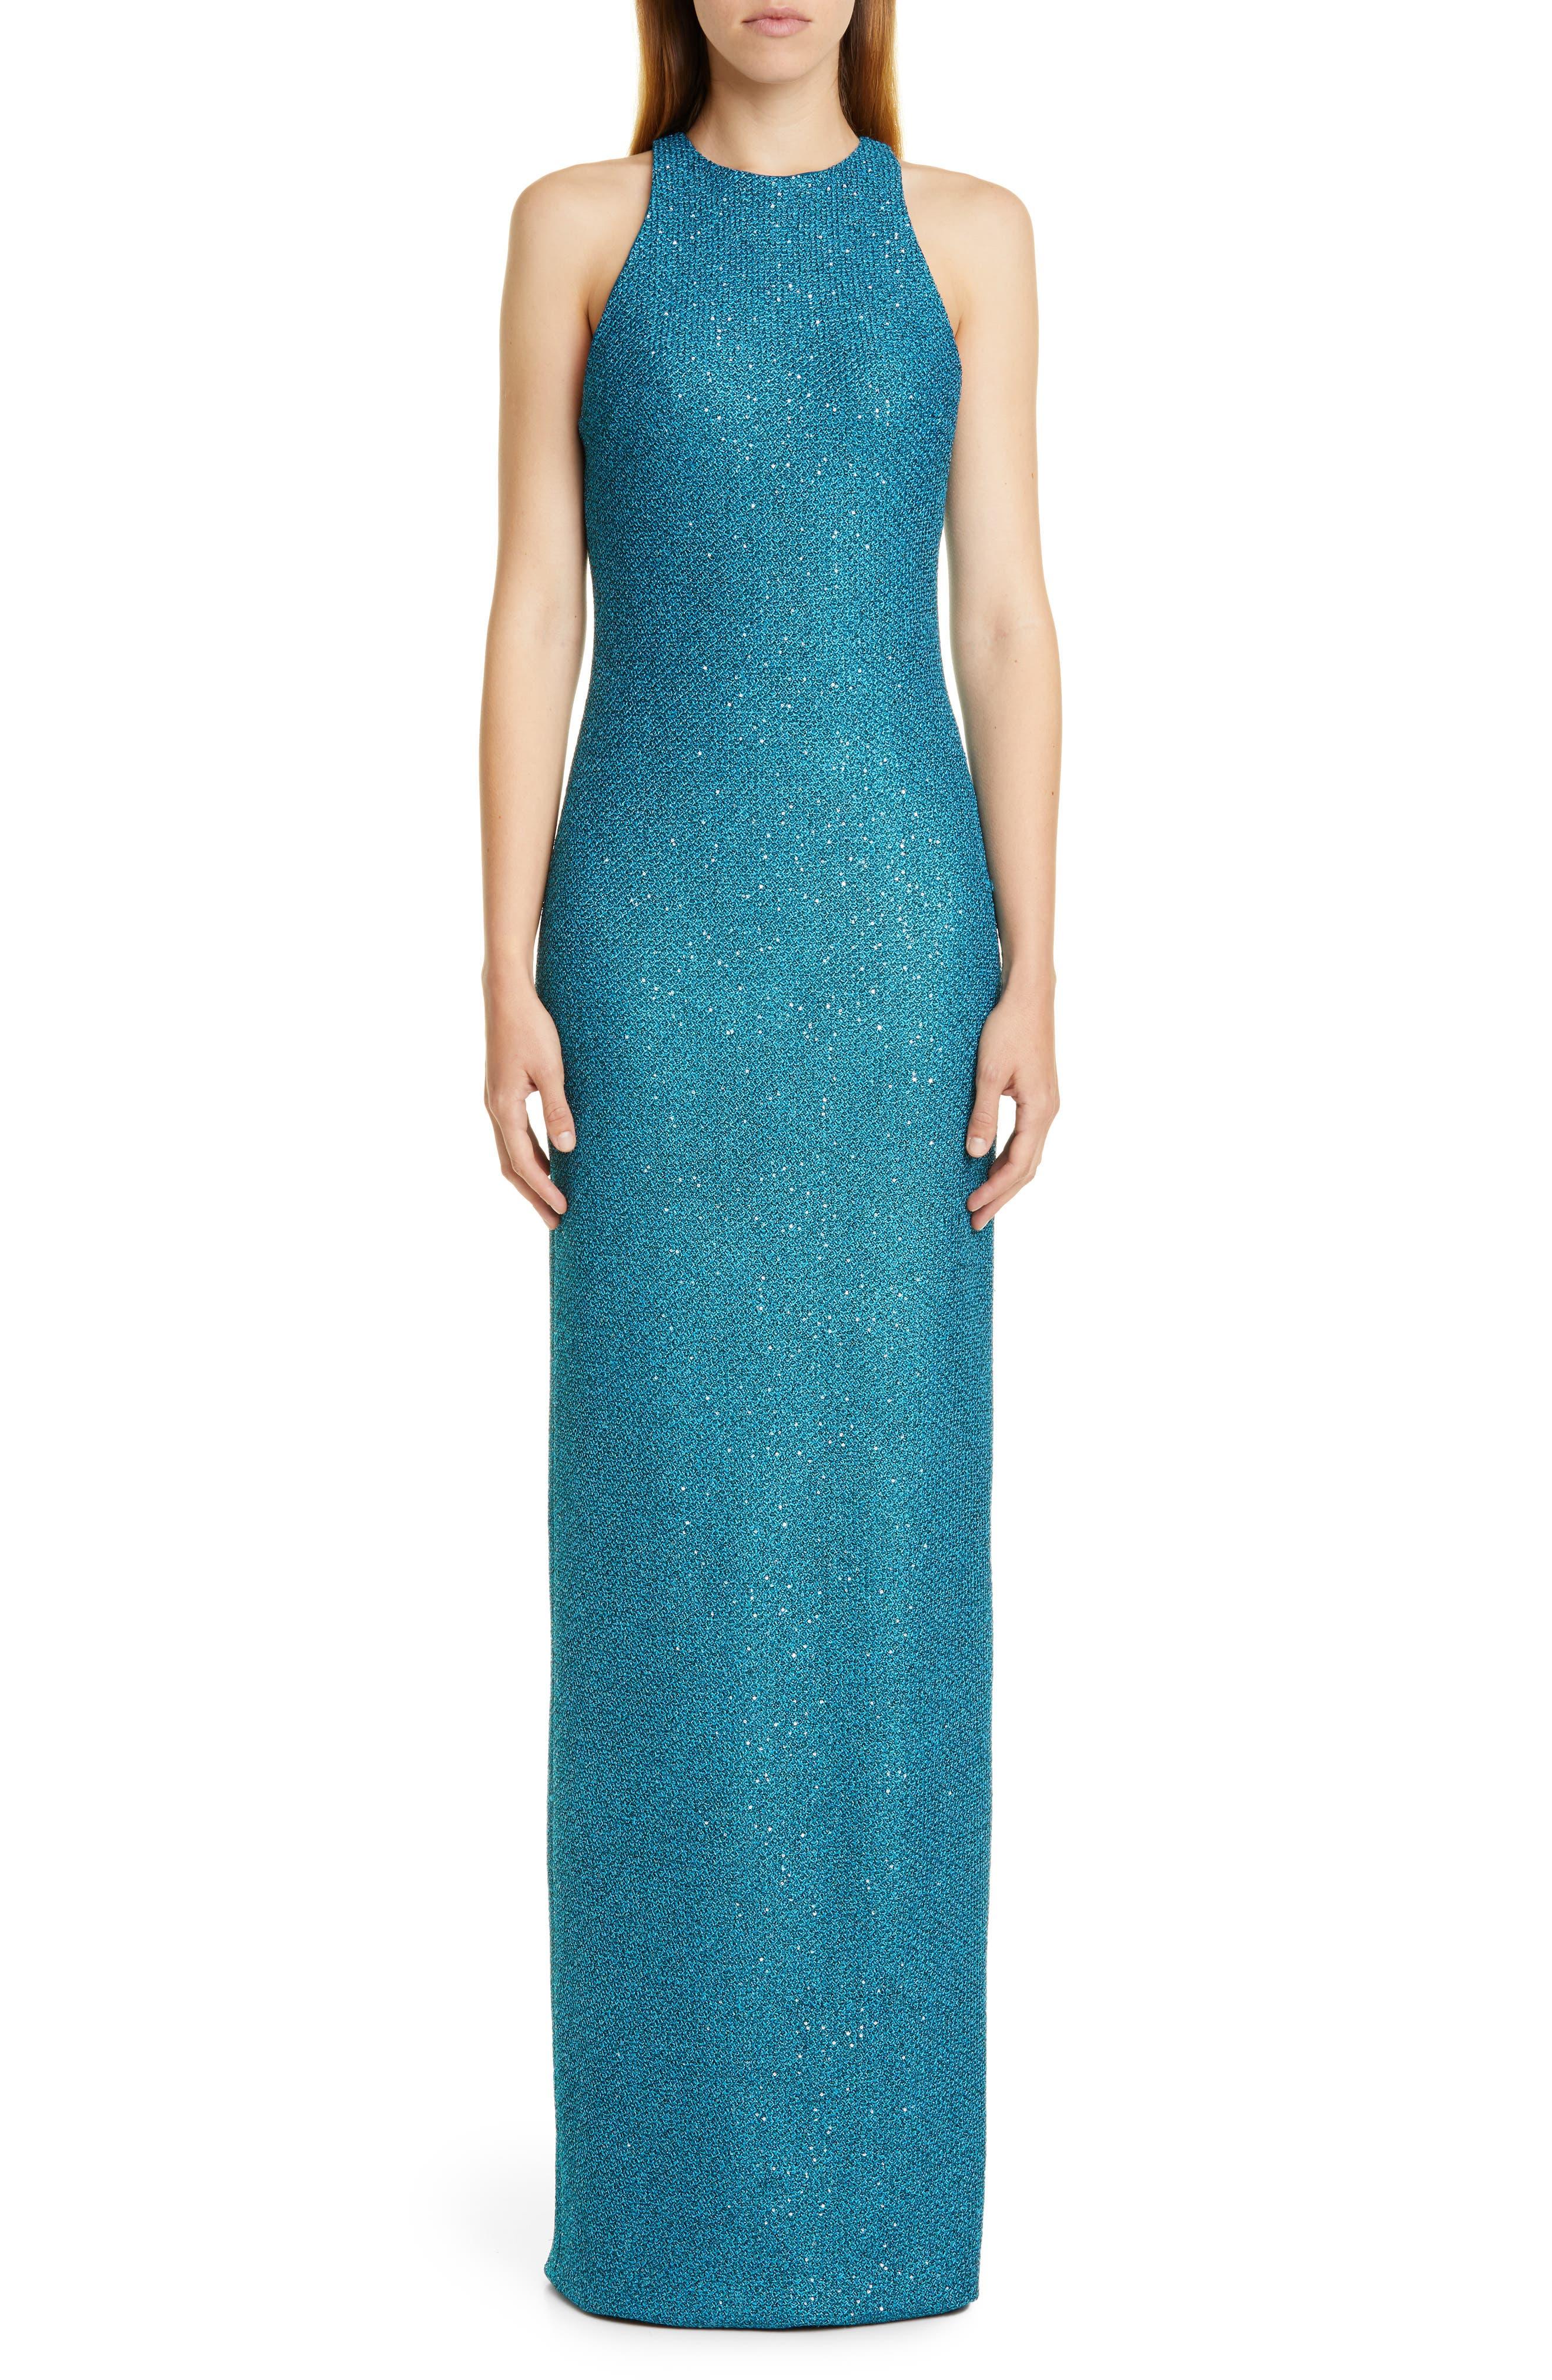 St. John Collection Luxe Sequin Tuck Knit Evening Dress, Blue